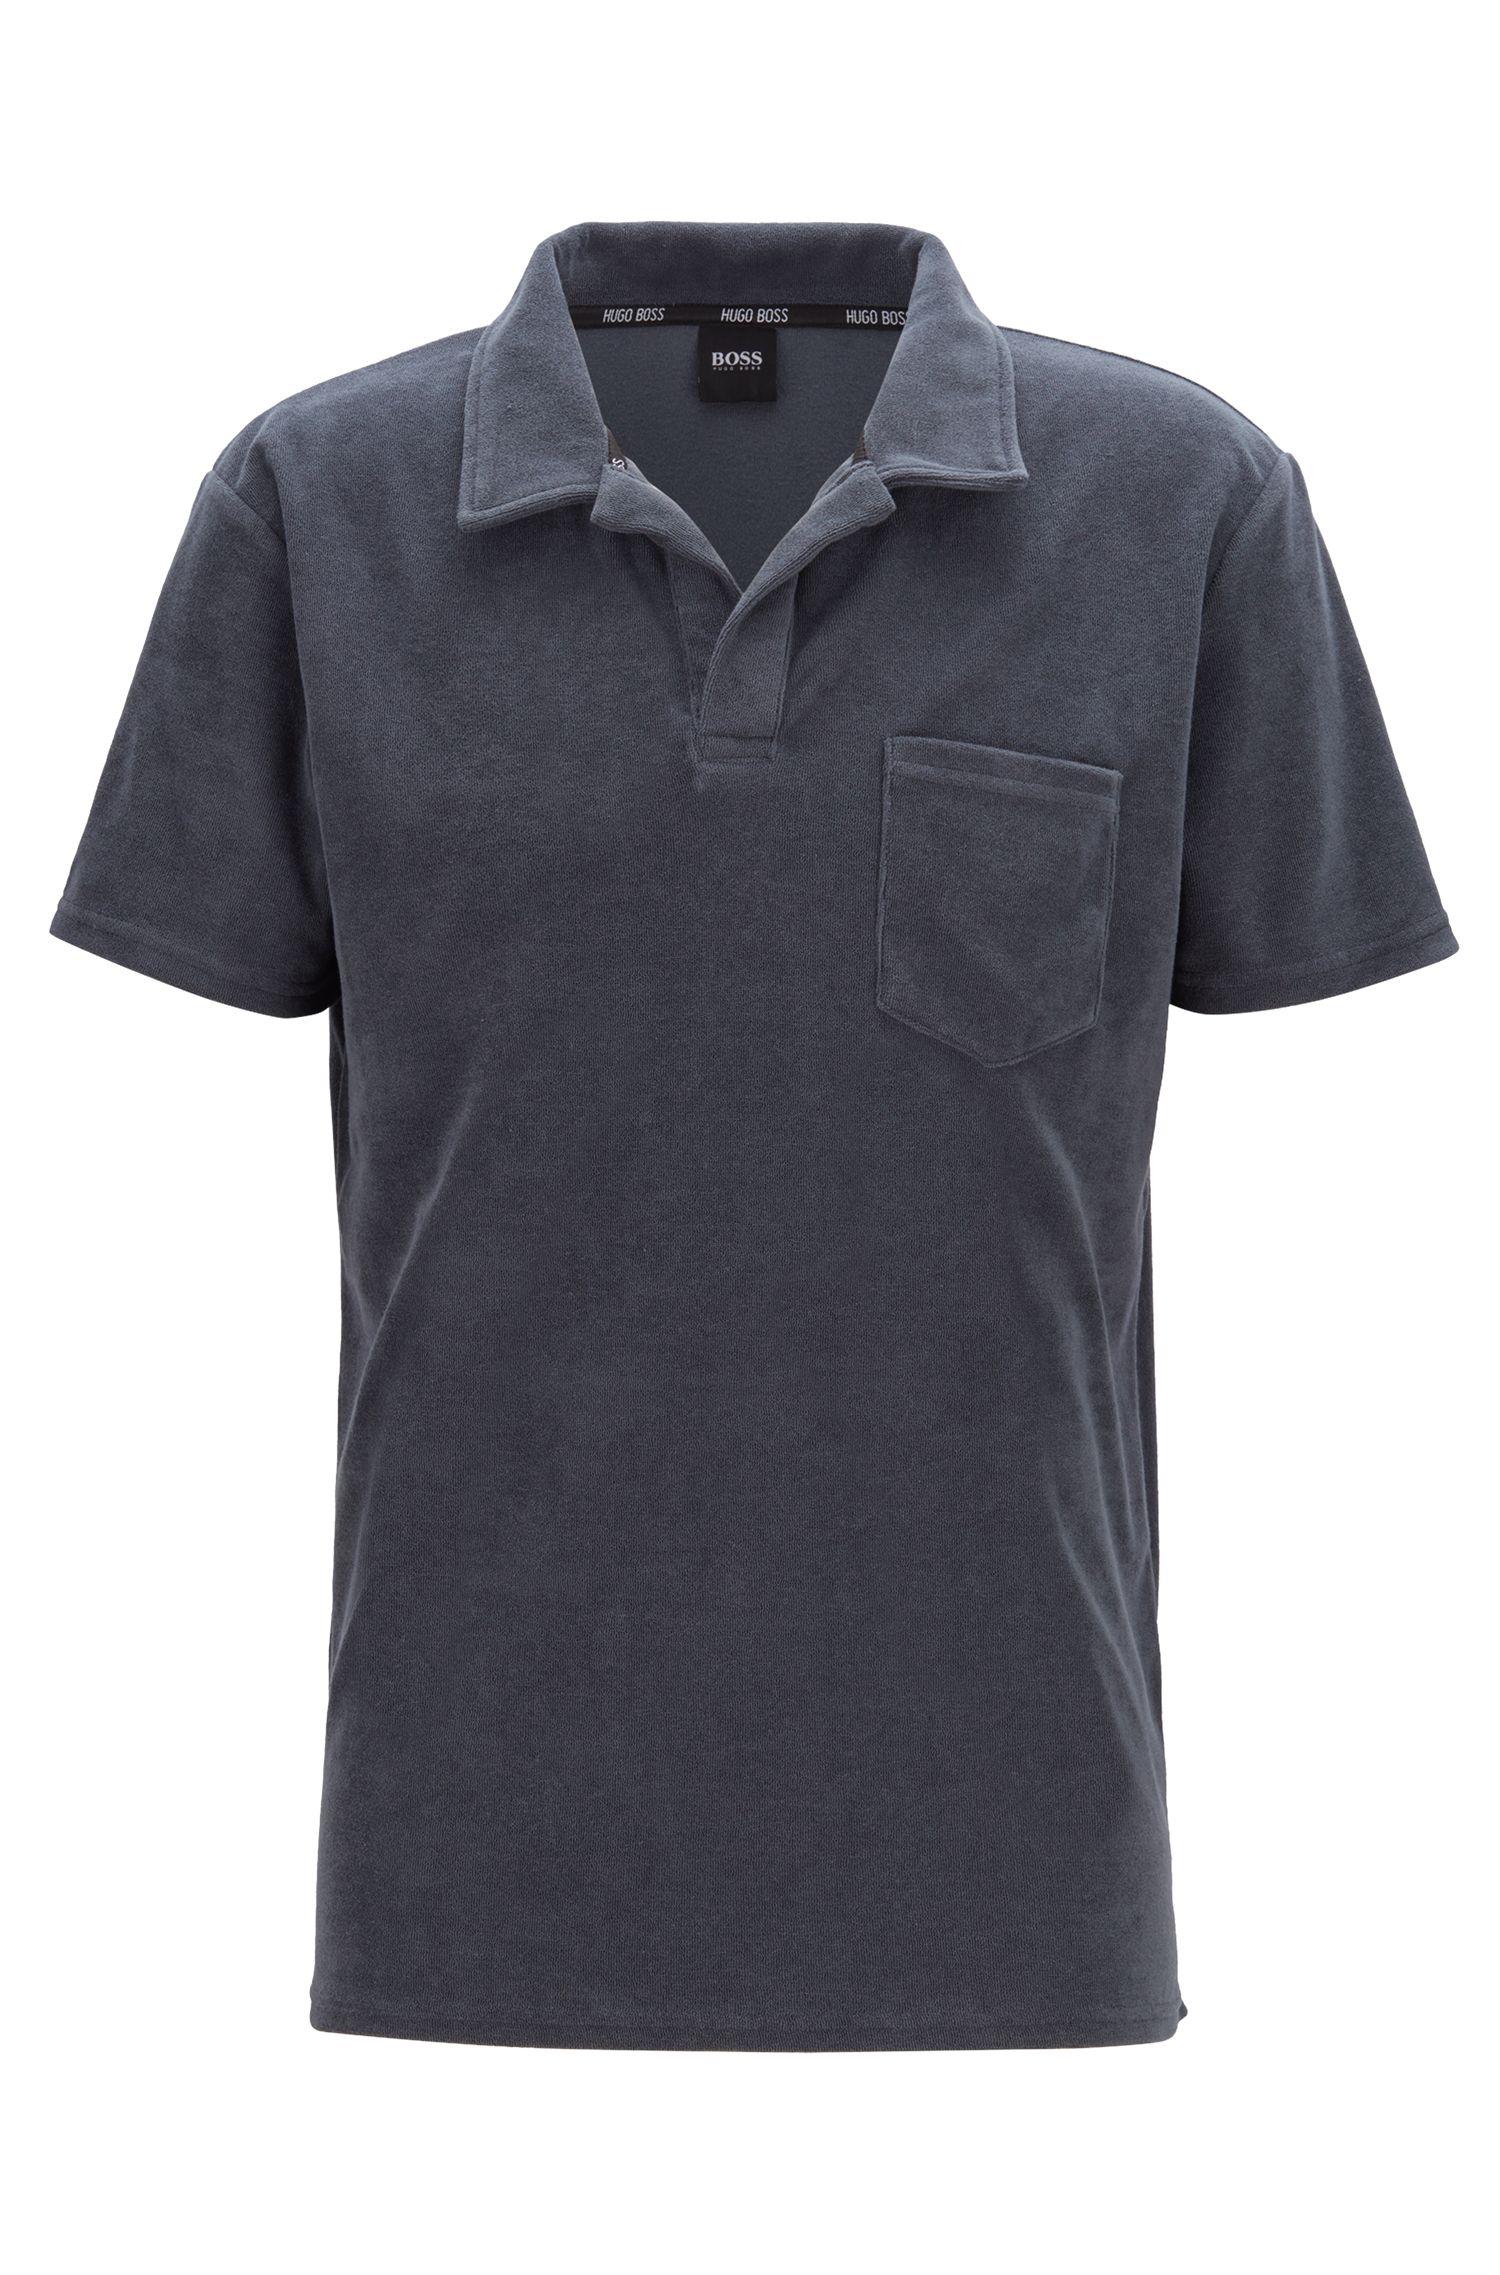 Beach polo shirt in cotton-blend terry, Dark Grey